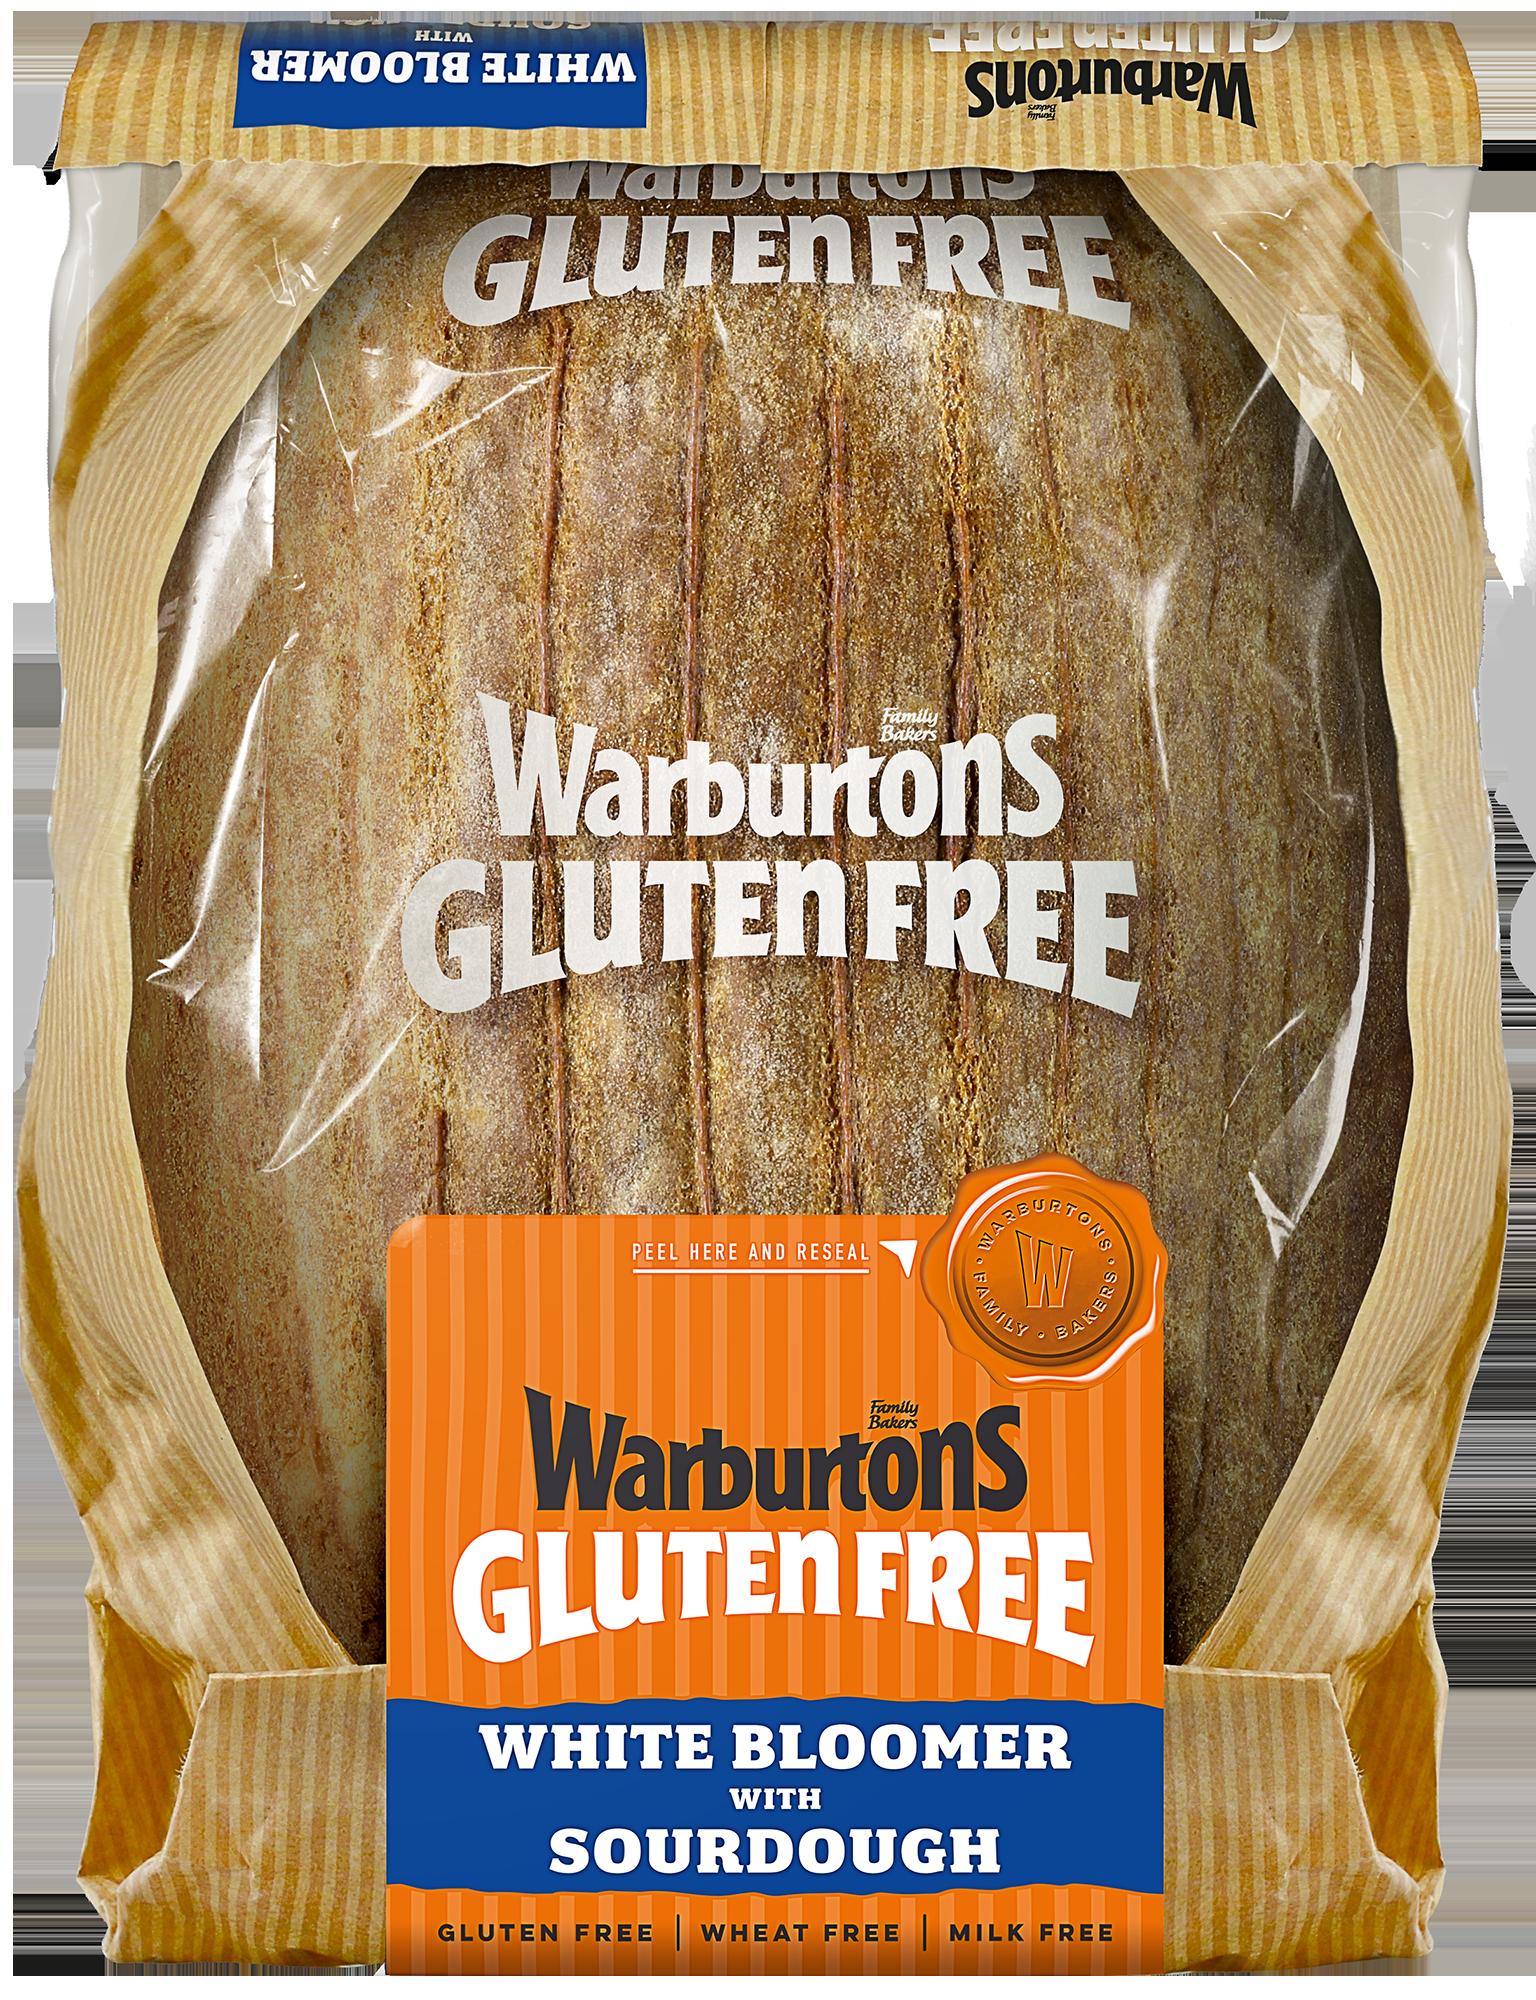 Warburtons White Bloomer with Sourdough (GF)